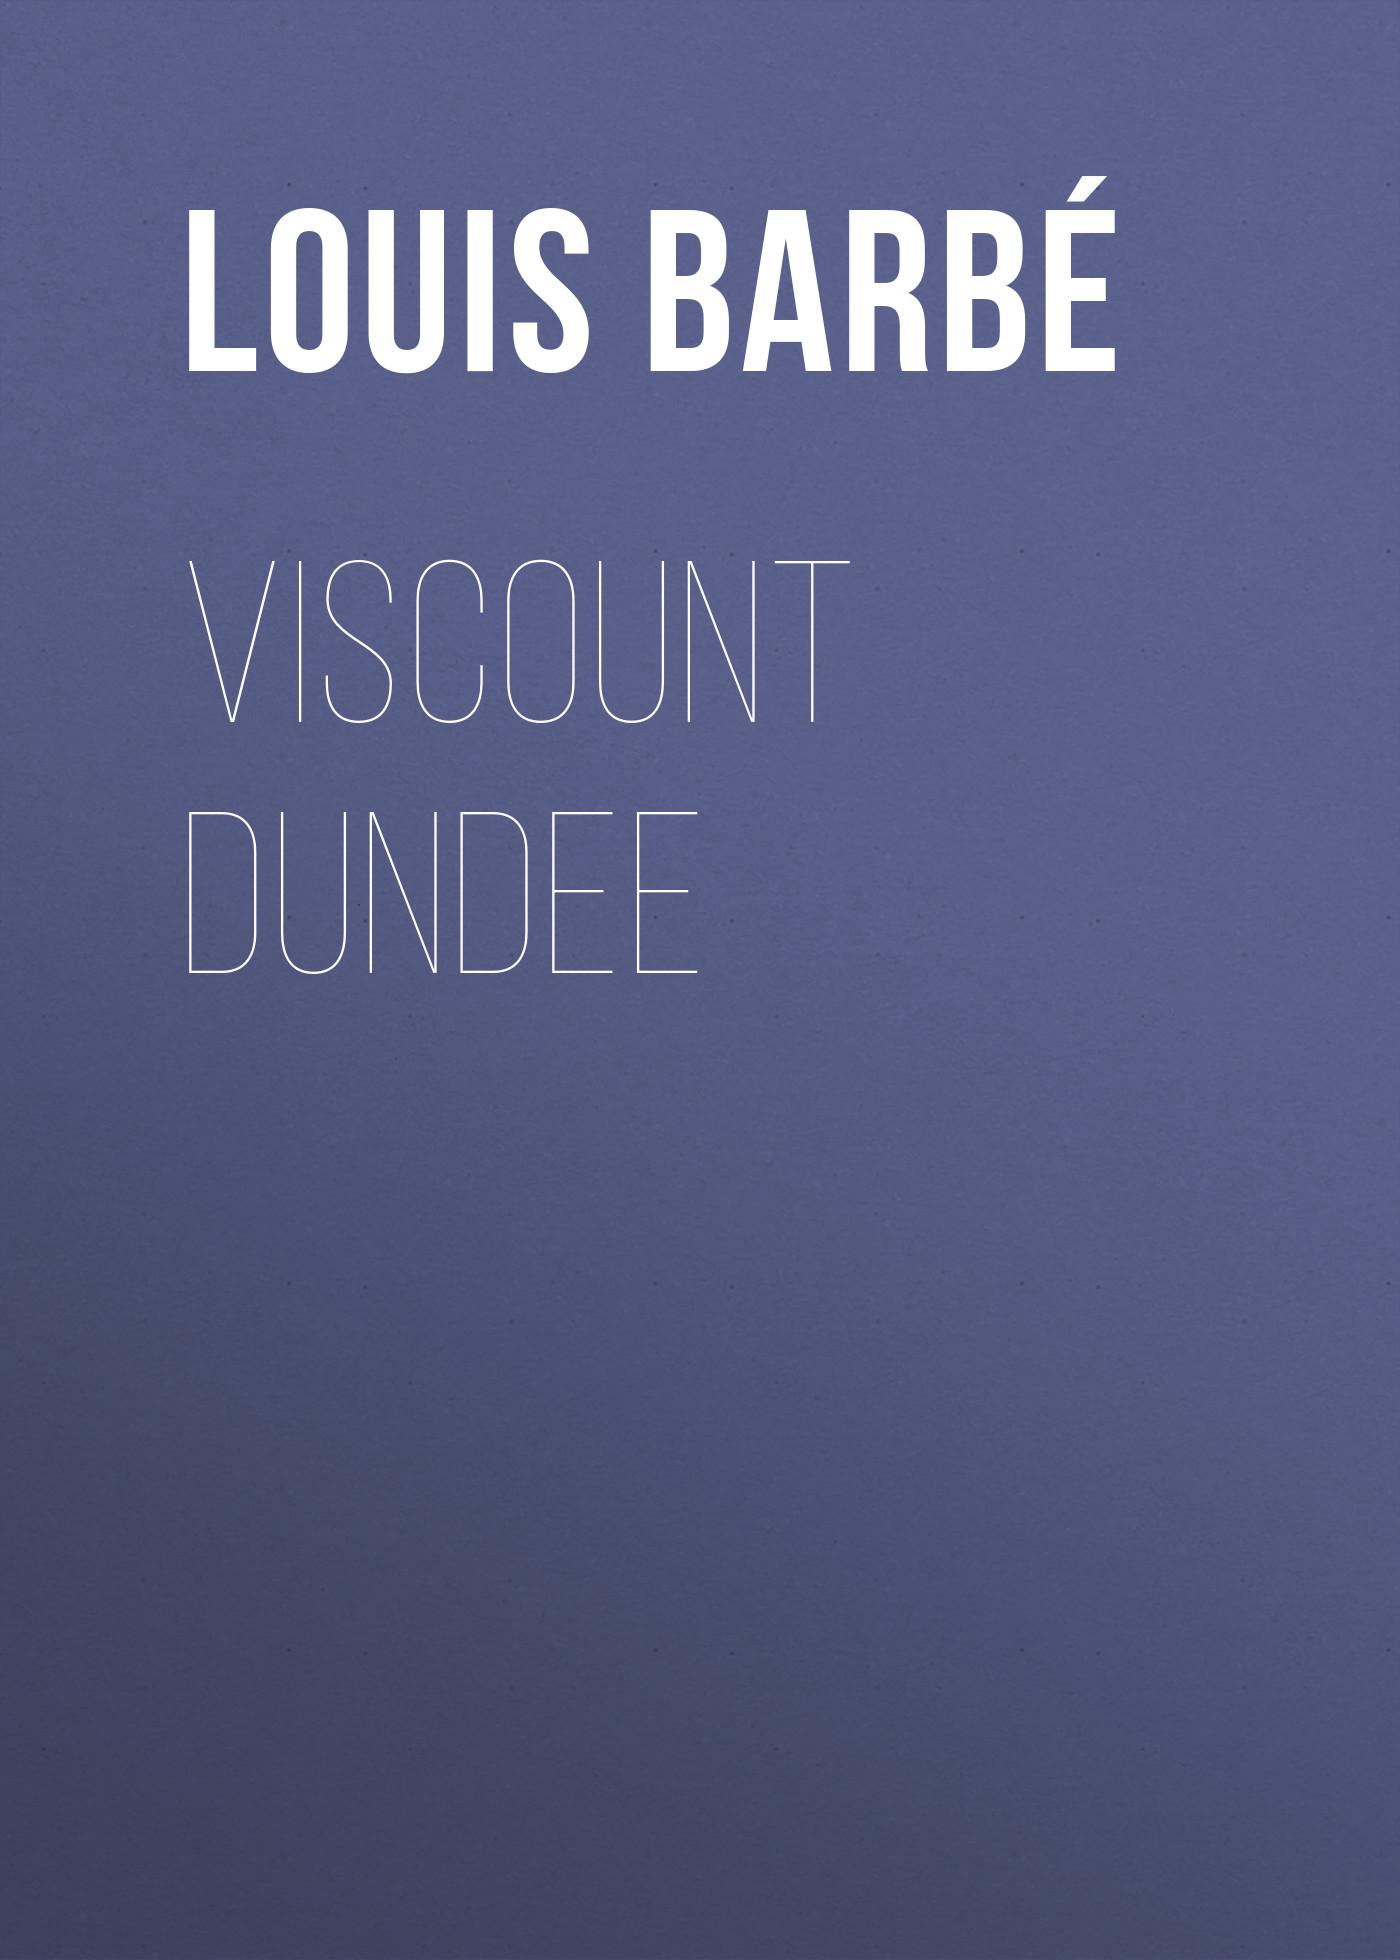 viscount dundee